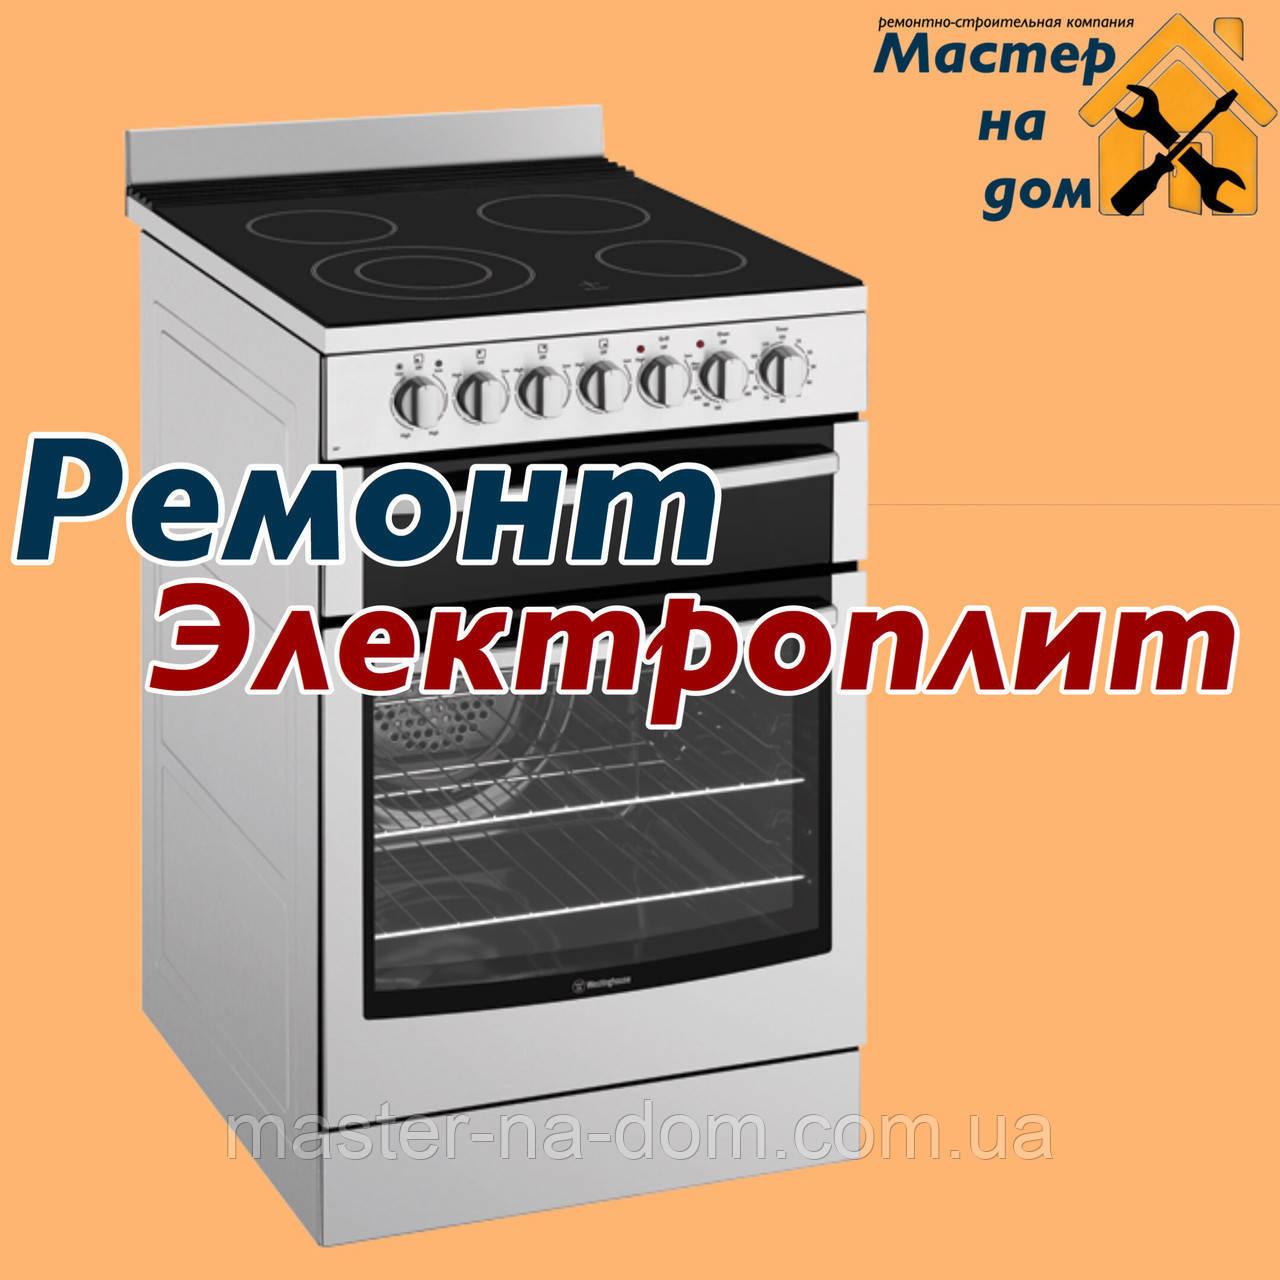 Ремонт електричної плити у Хмельницькому